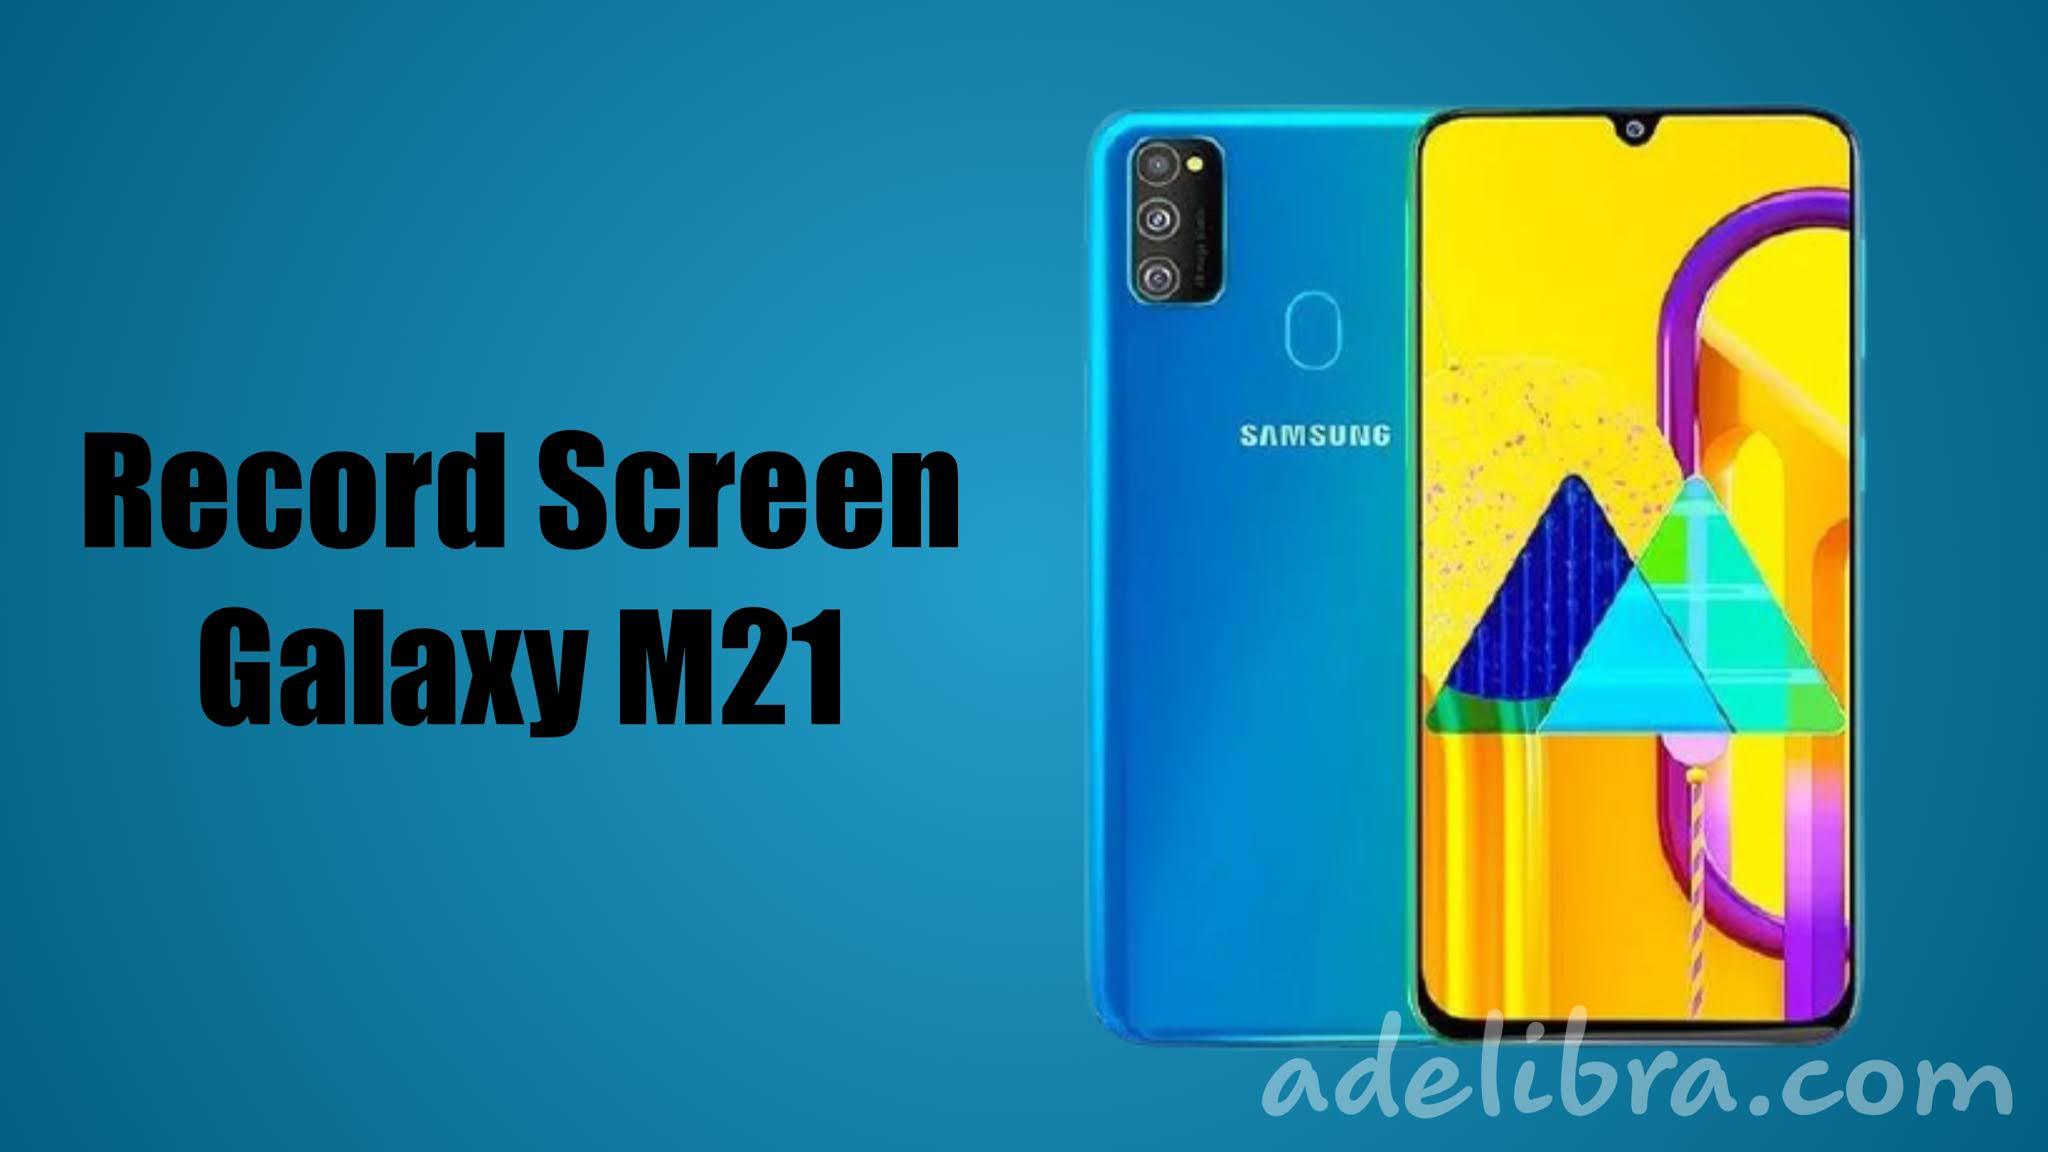 Record Screen Samsung Galaxy M21